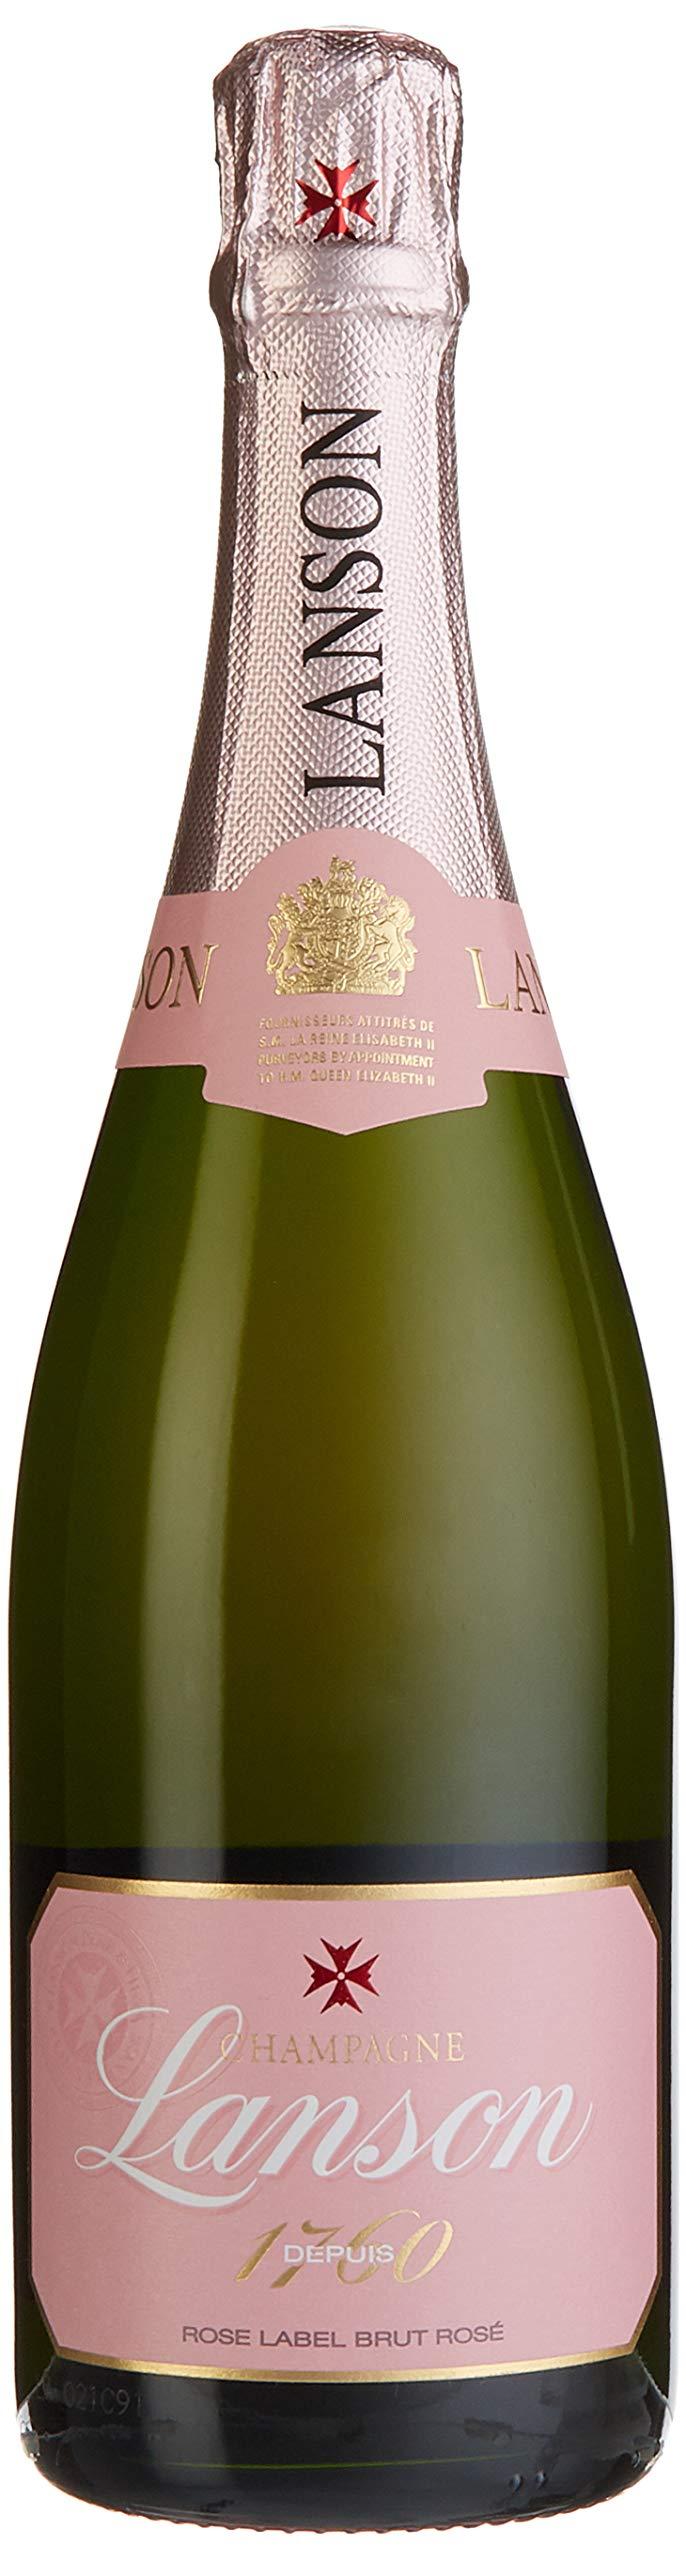 Lanson-Ros-Lable-Champagne-1-x-075-l